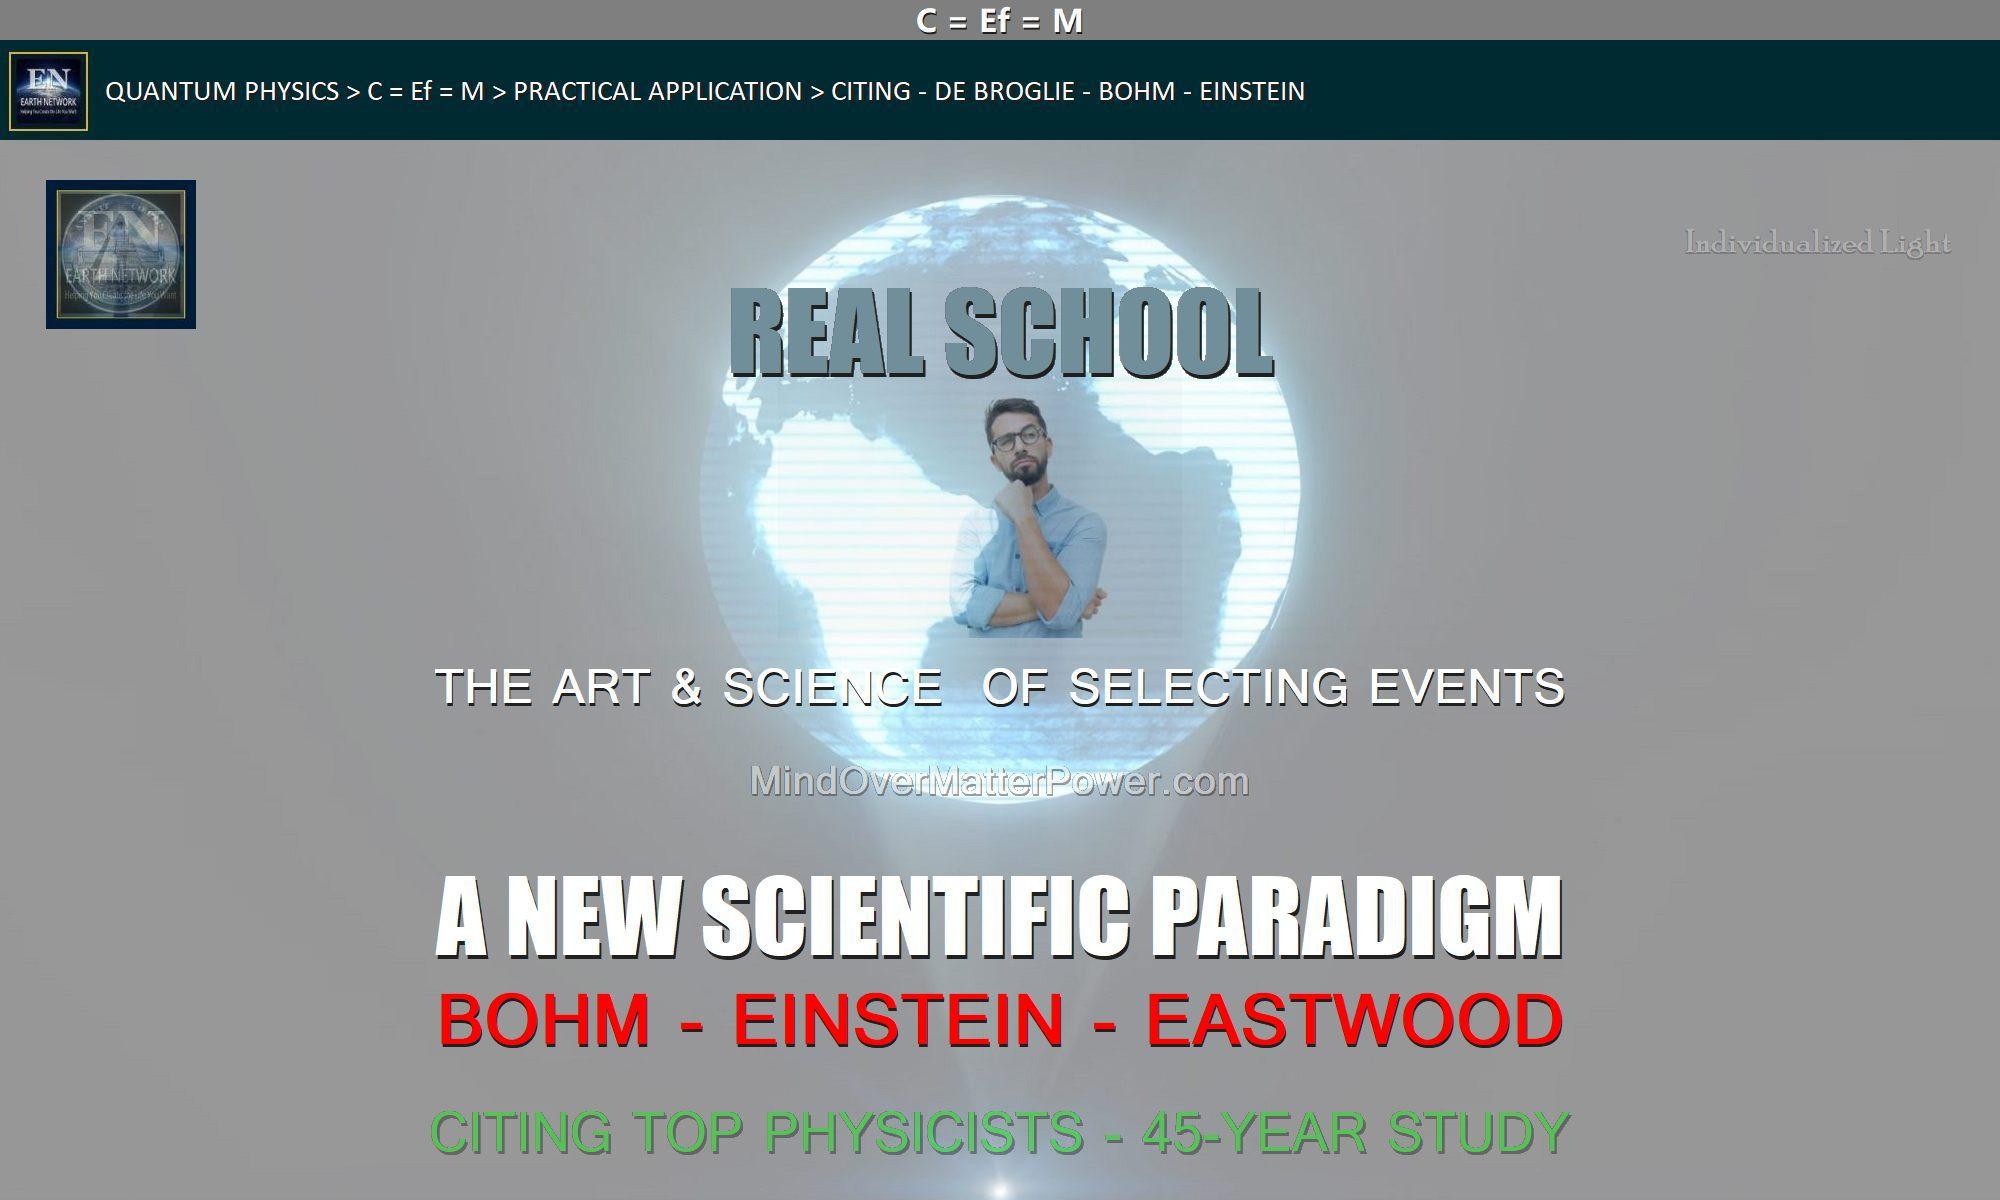 metaphysics-conscious-creation-education-consciousness-science-books-paradigm